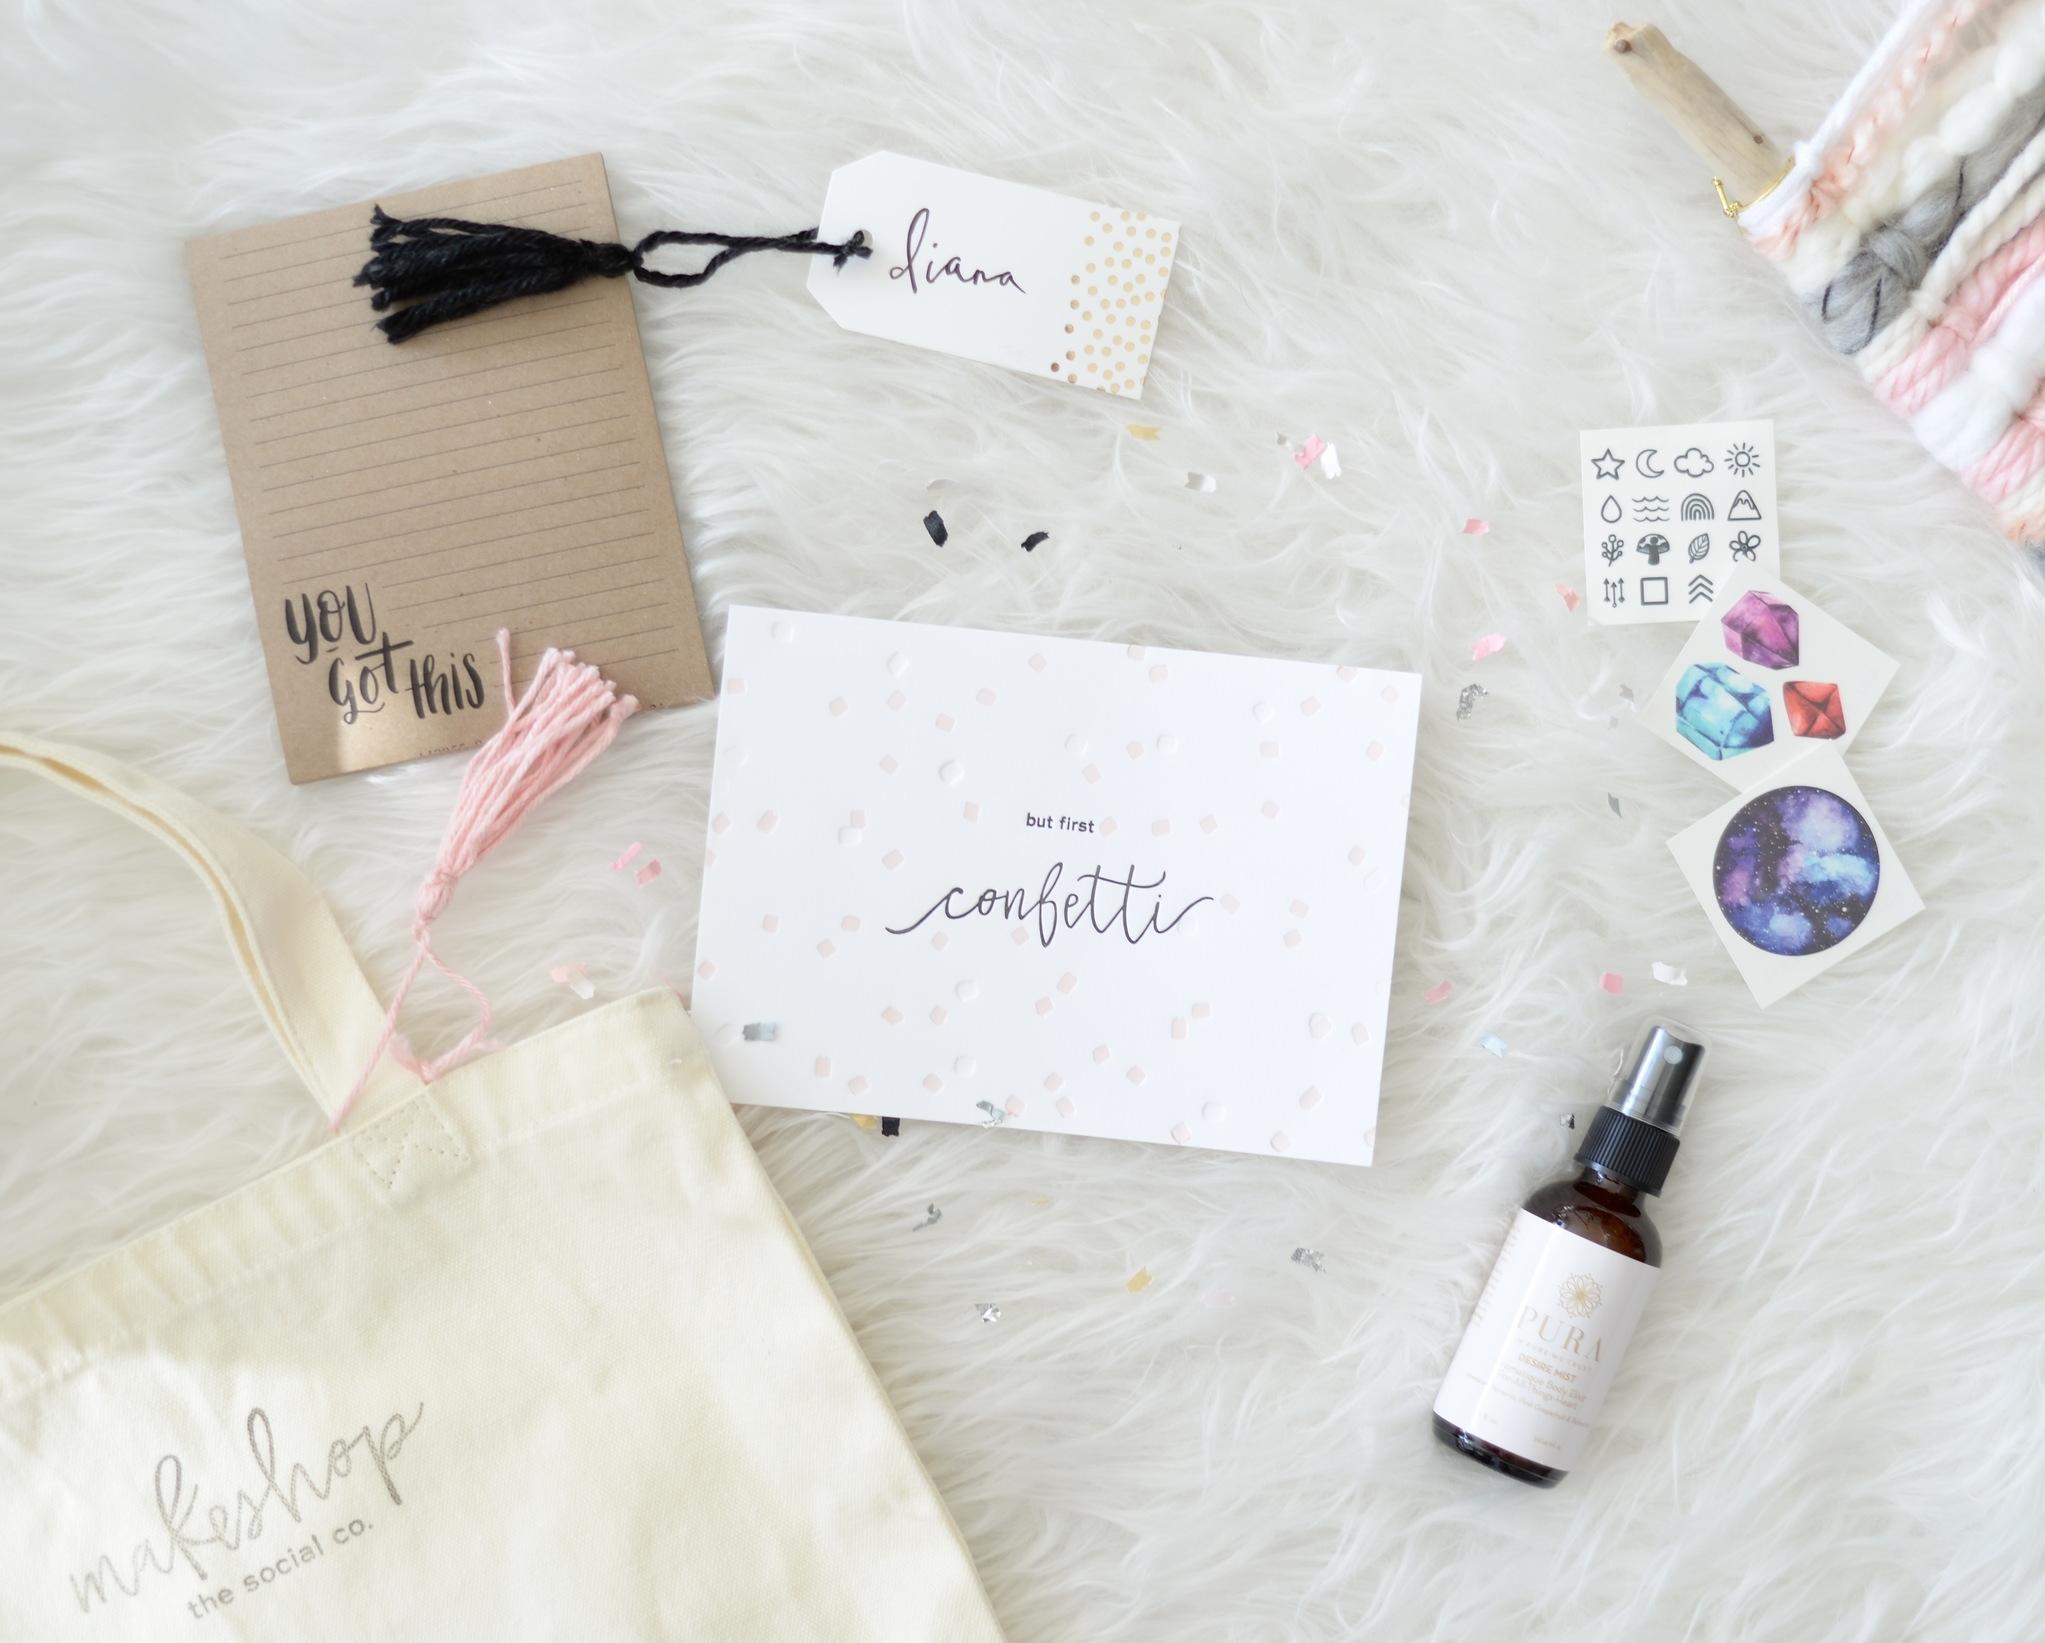 makeshop social gift bag.JPG